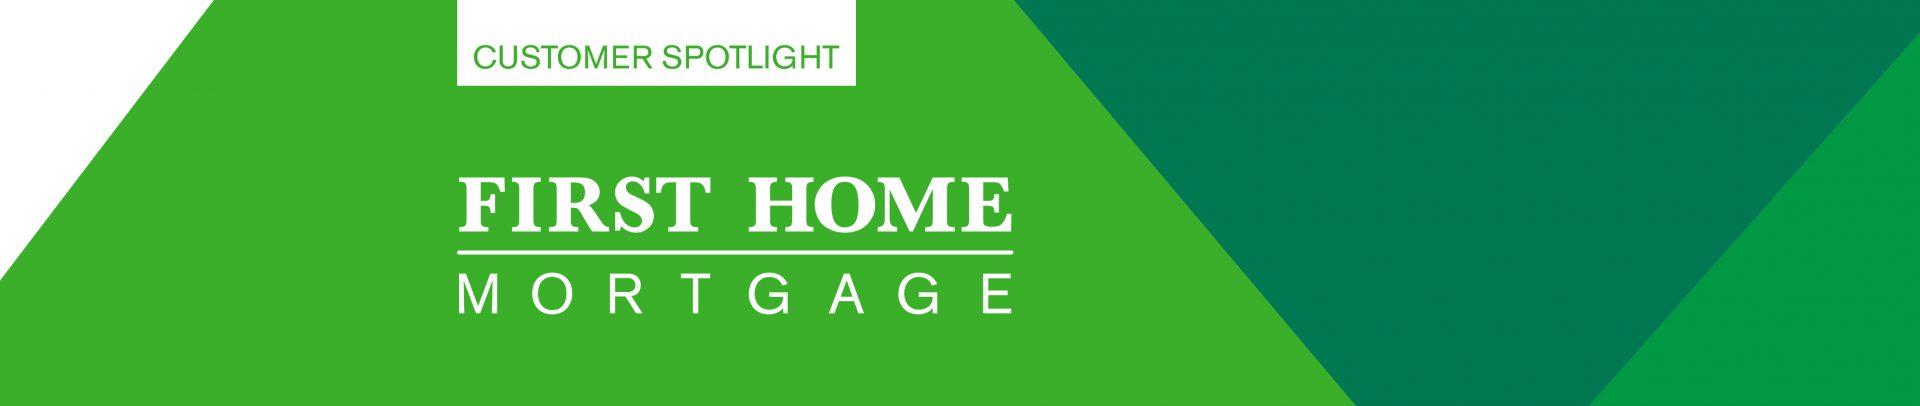 First Home Mortgage Customer Spotlight